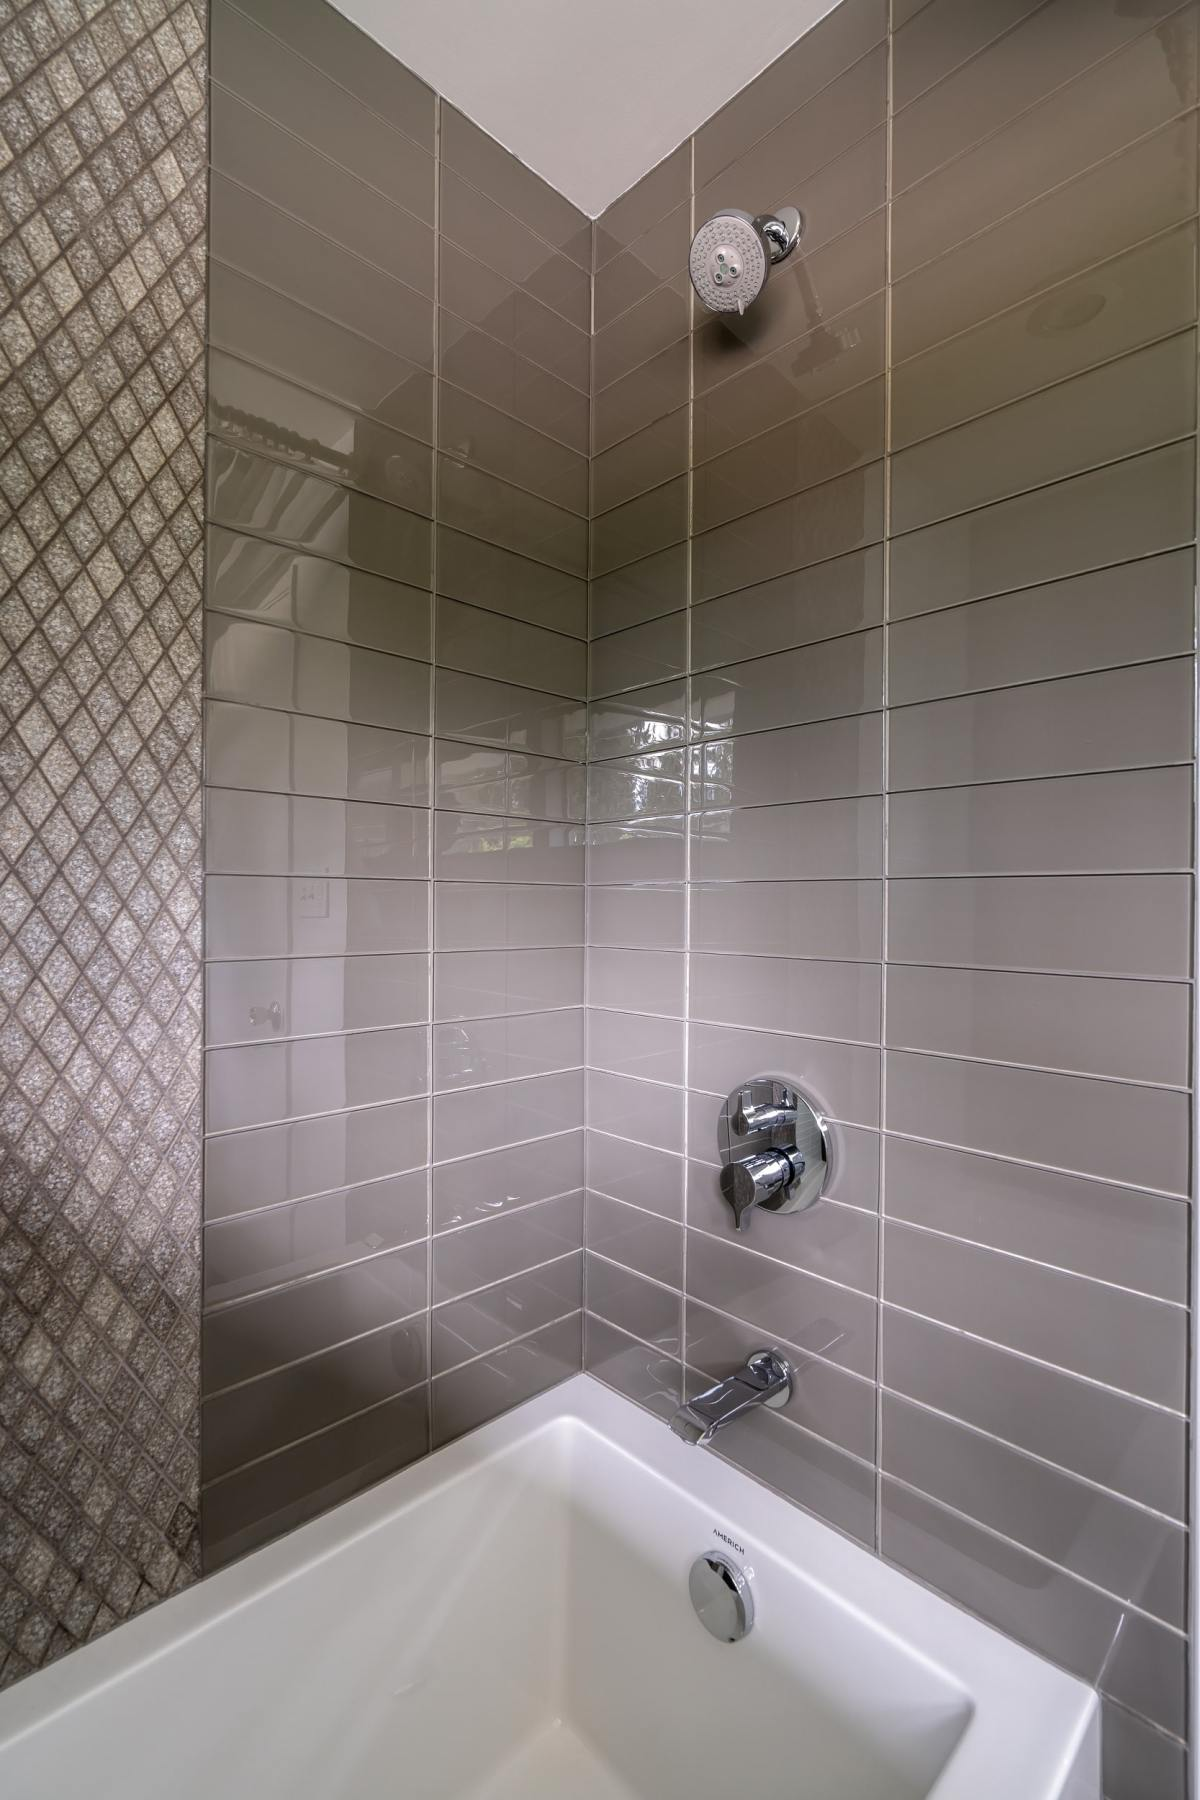 grey rectablge tile in bath tub shower